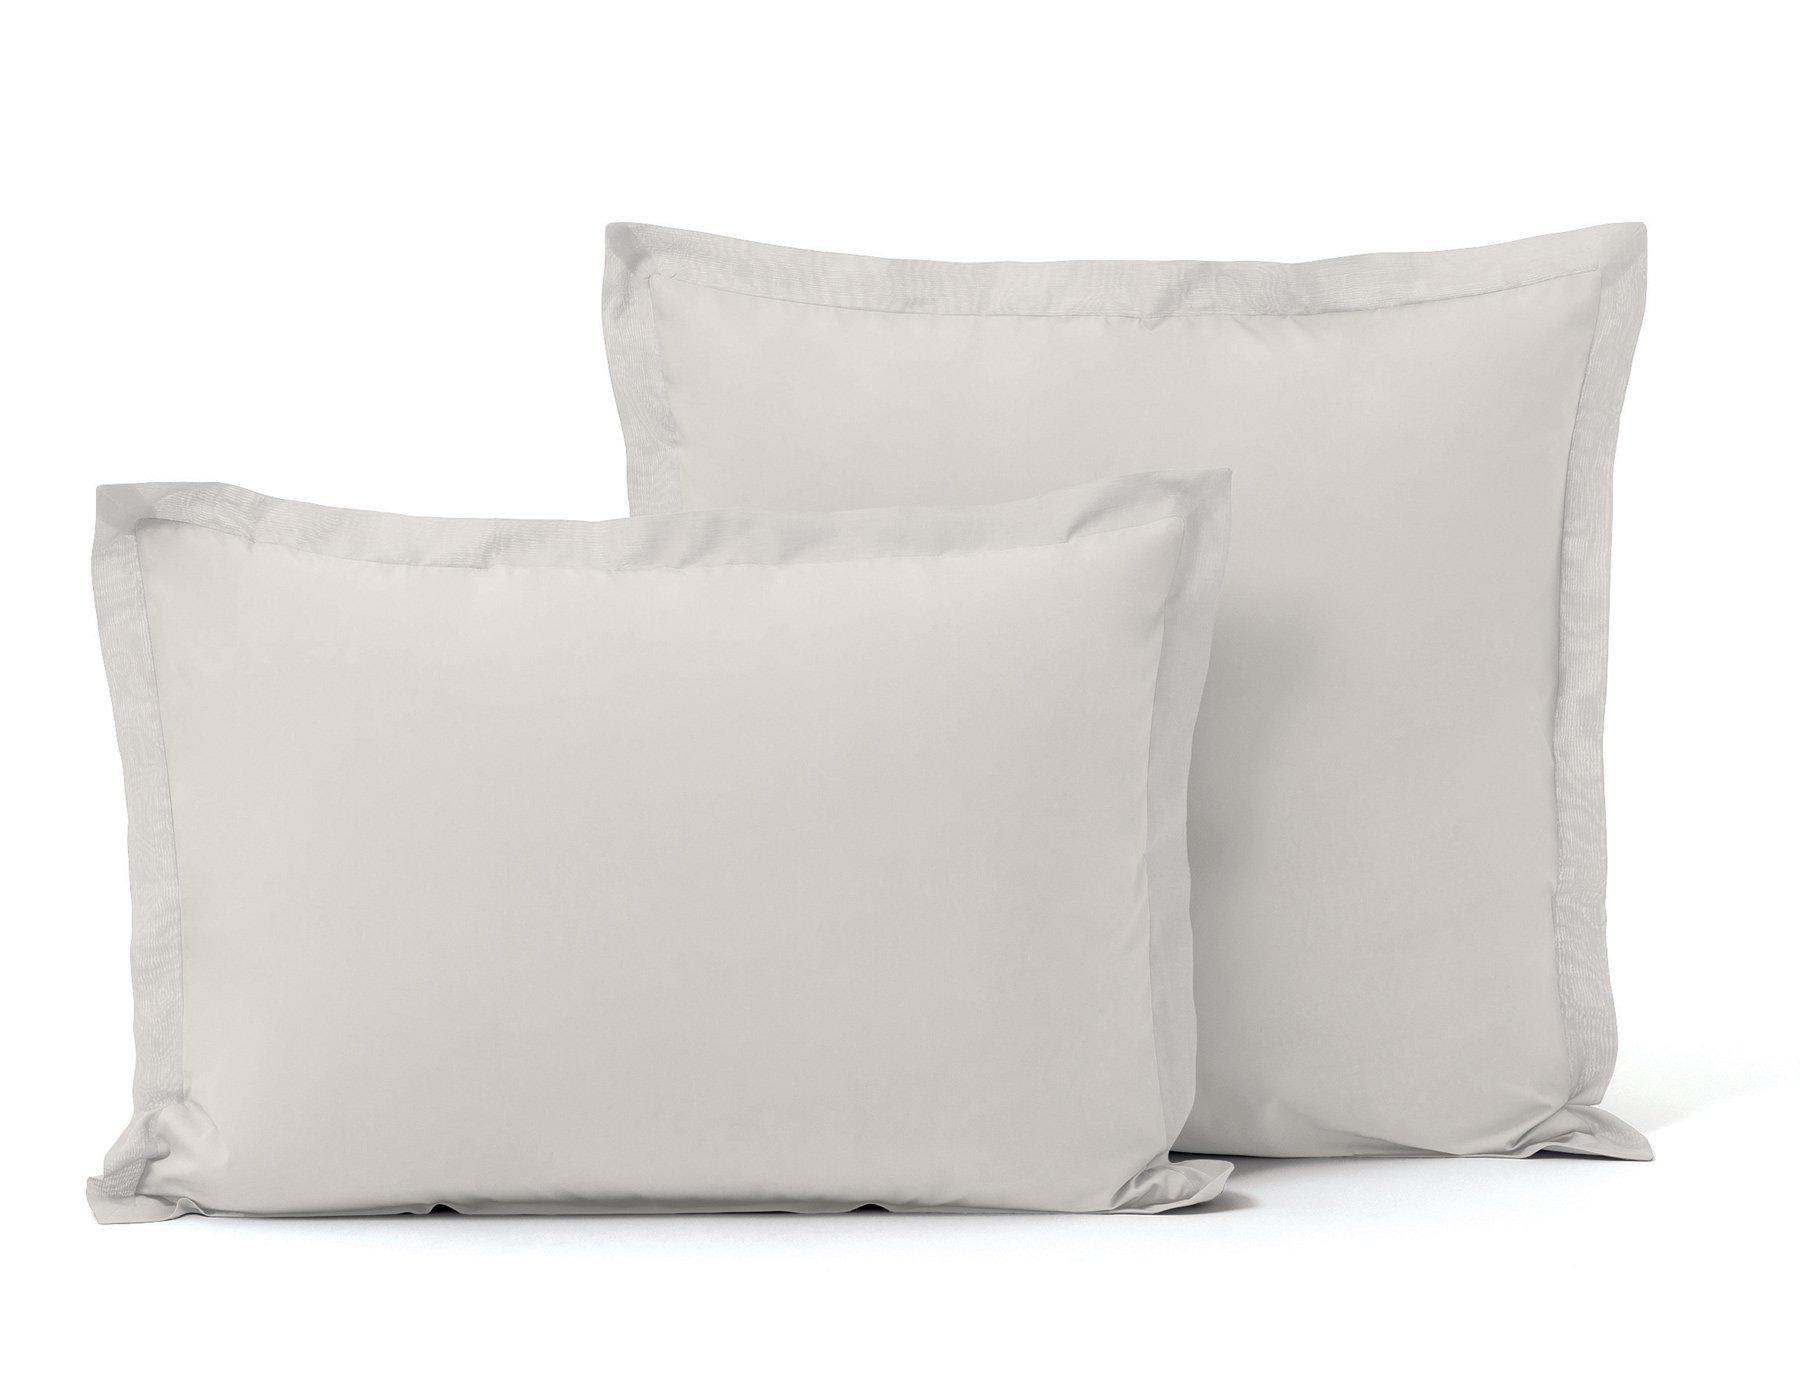 drap housse percale prestige linvosges. Black Bedroom Furniture Sets. Home Design Ideas